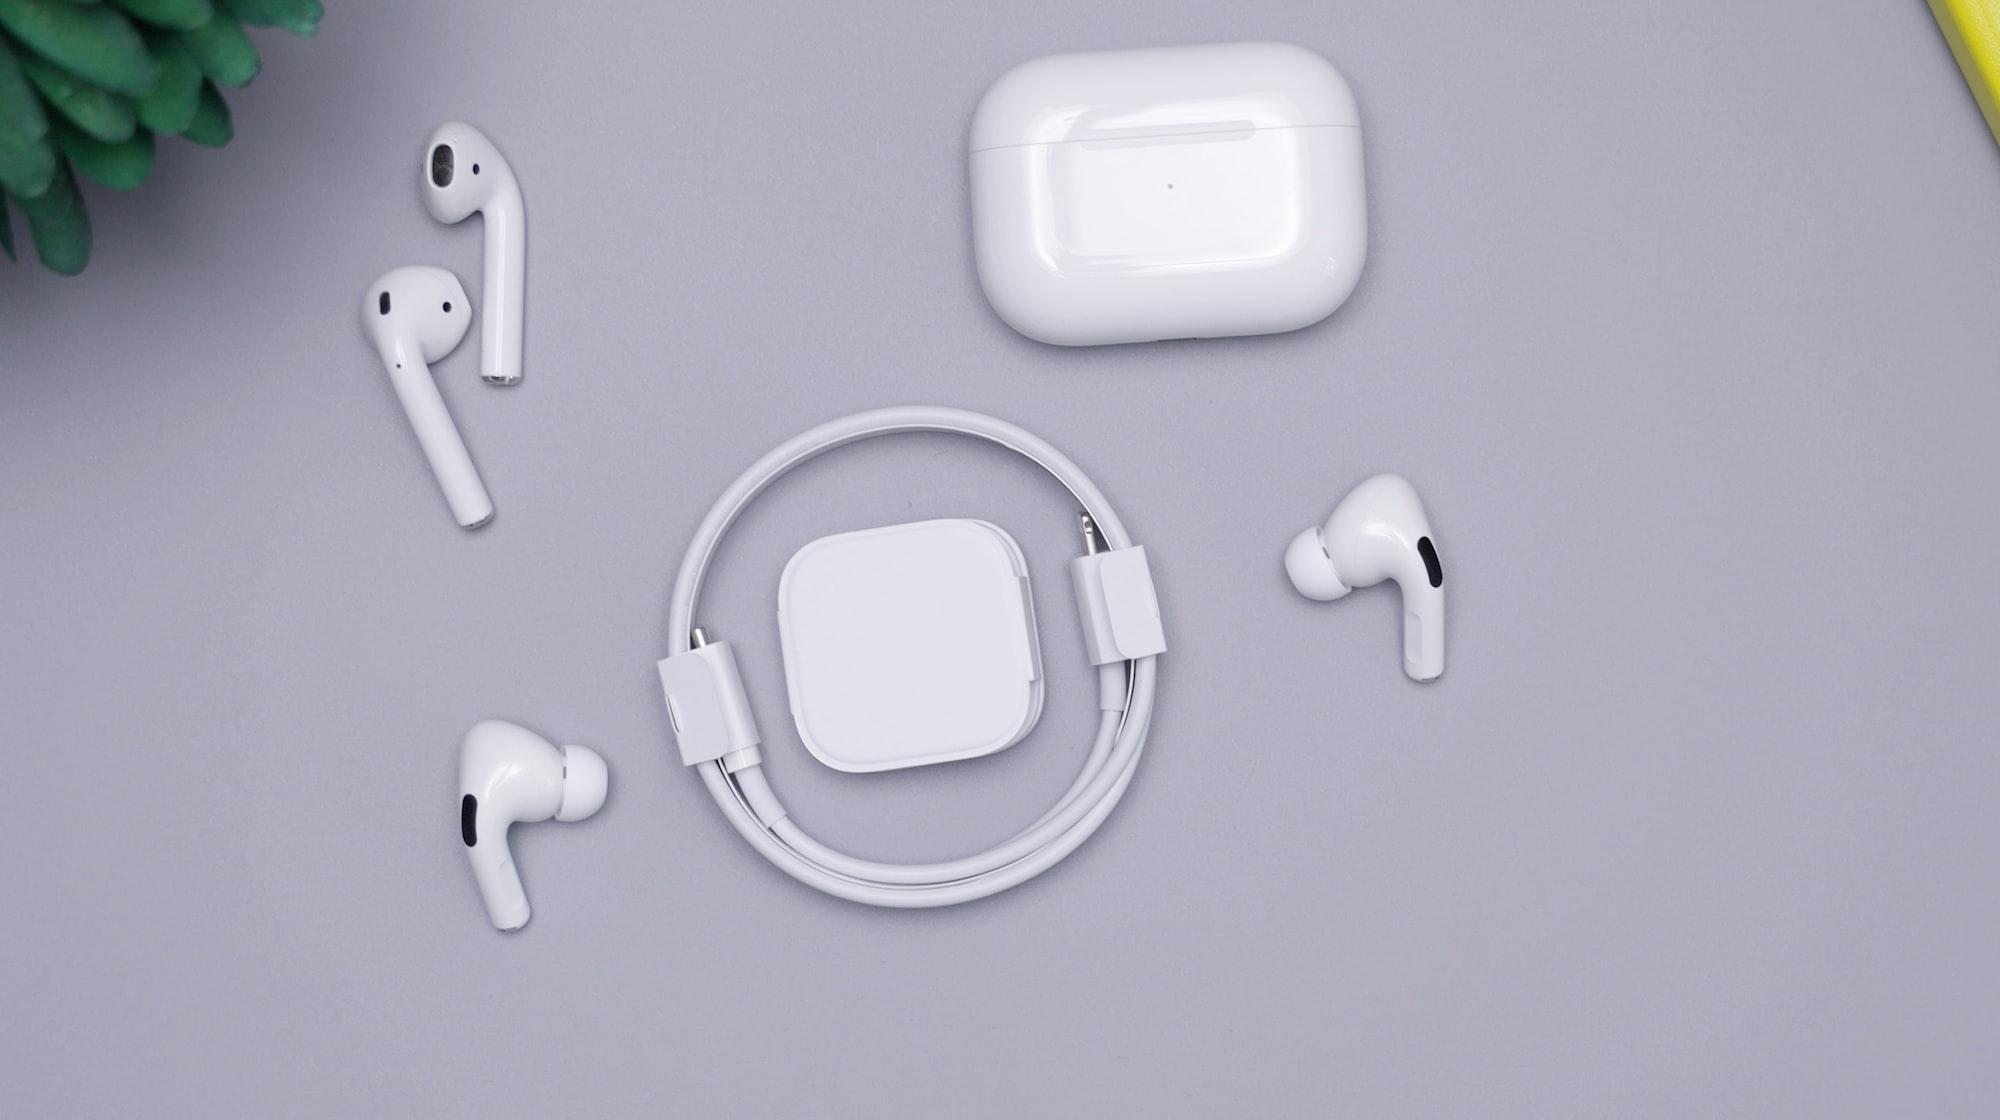 2019, My Year in Headphones